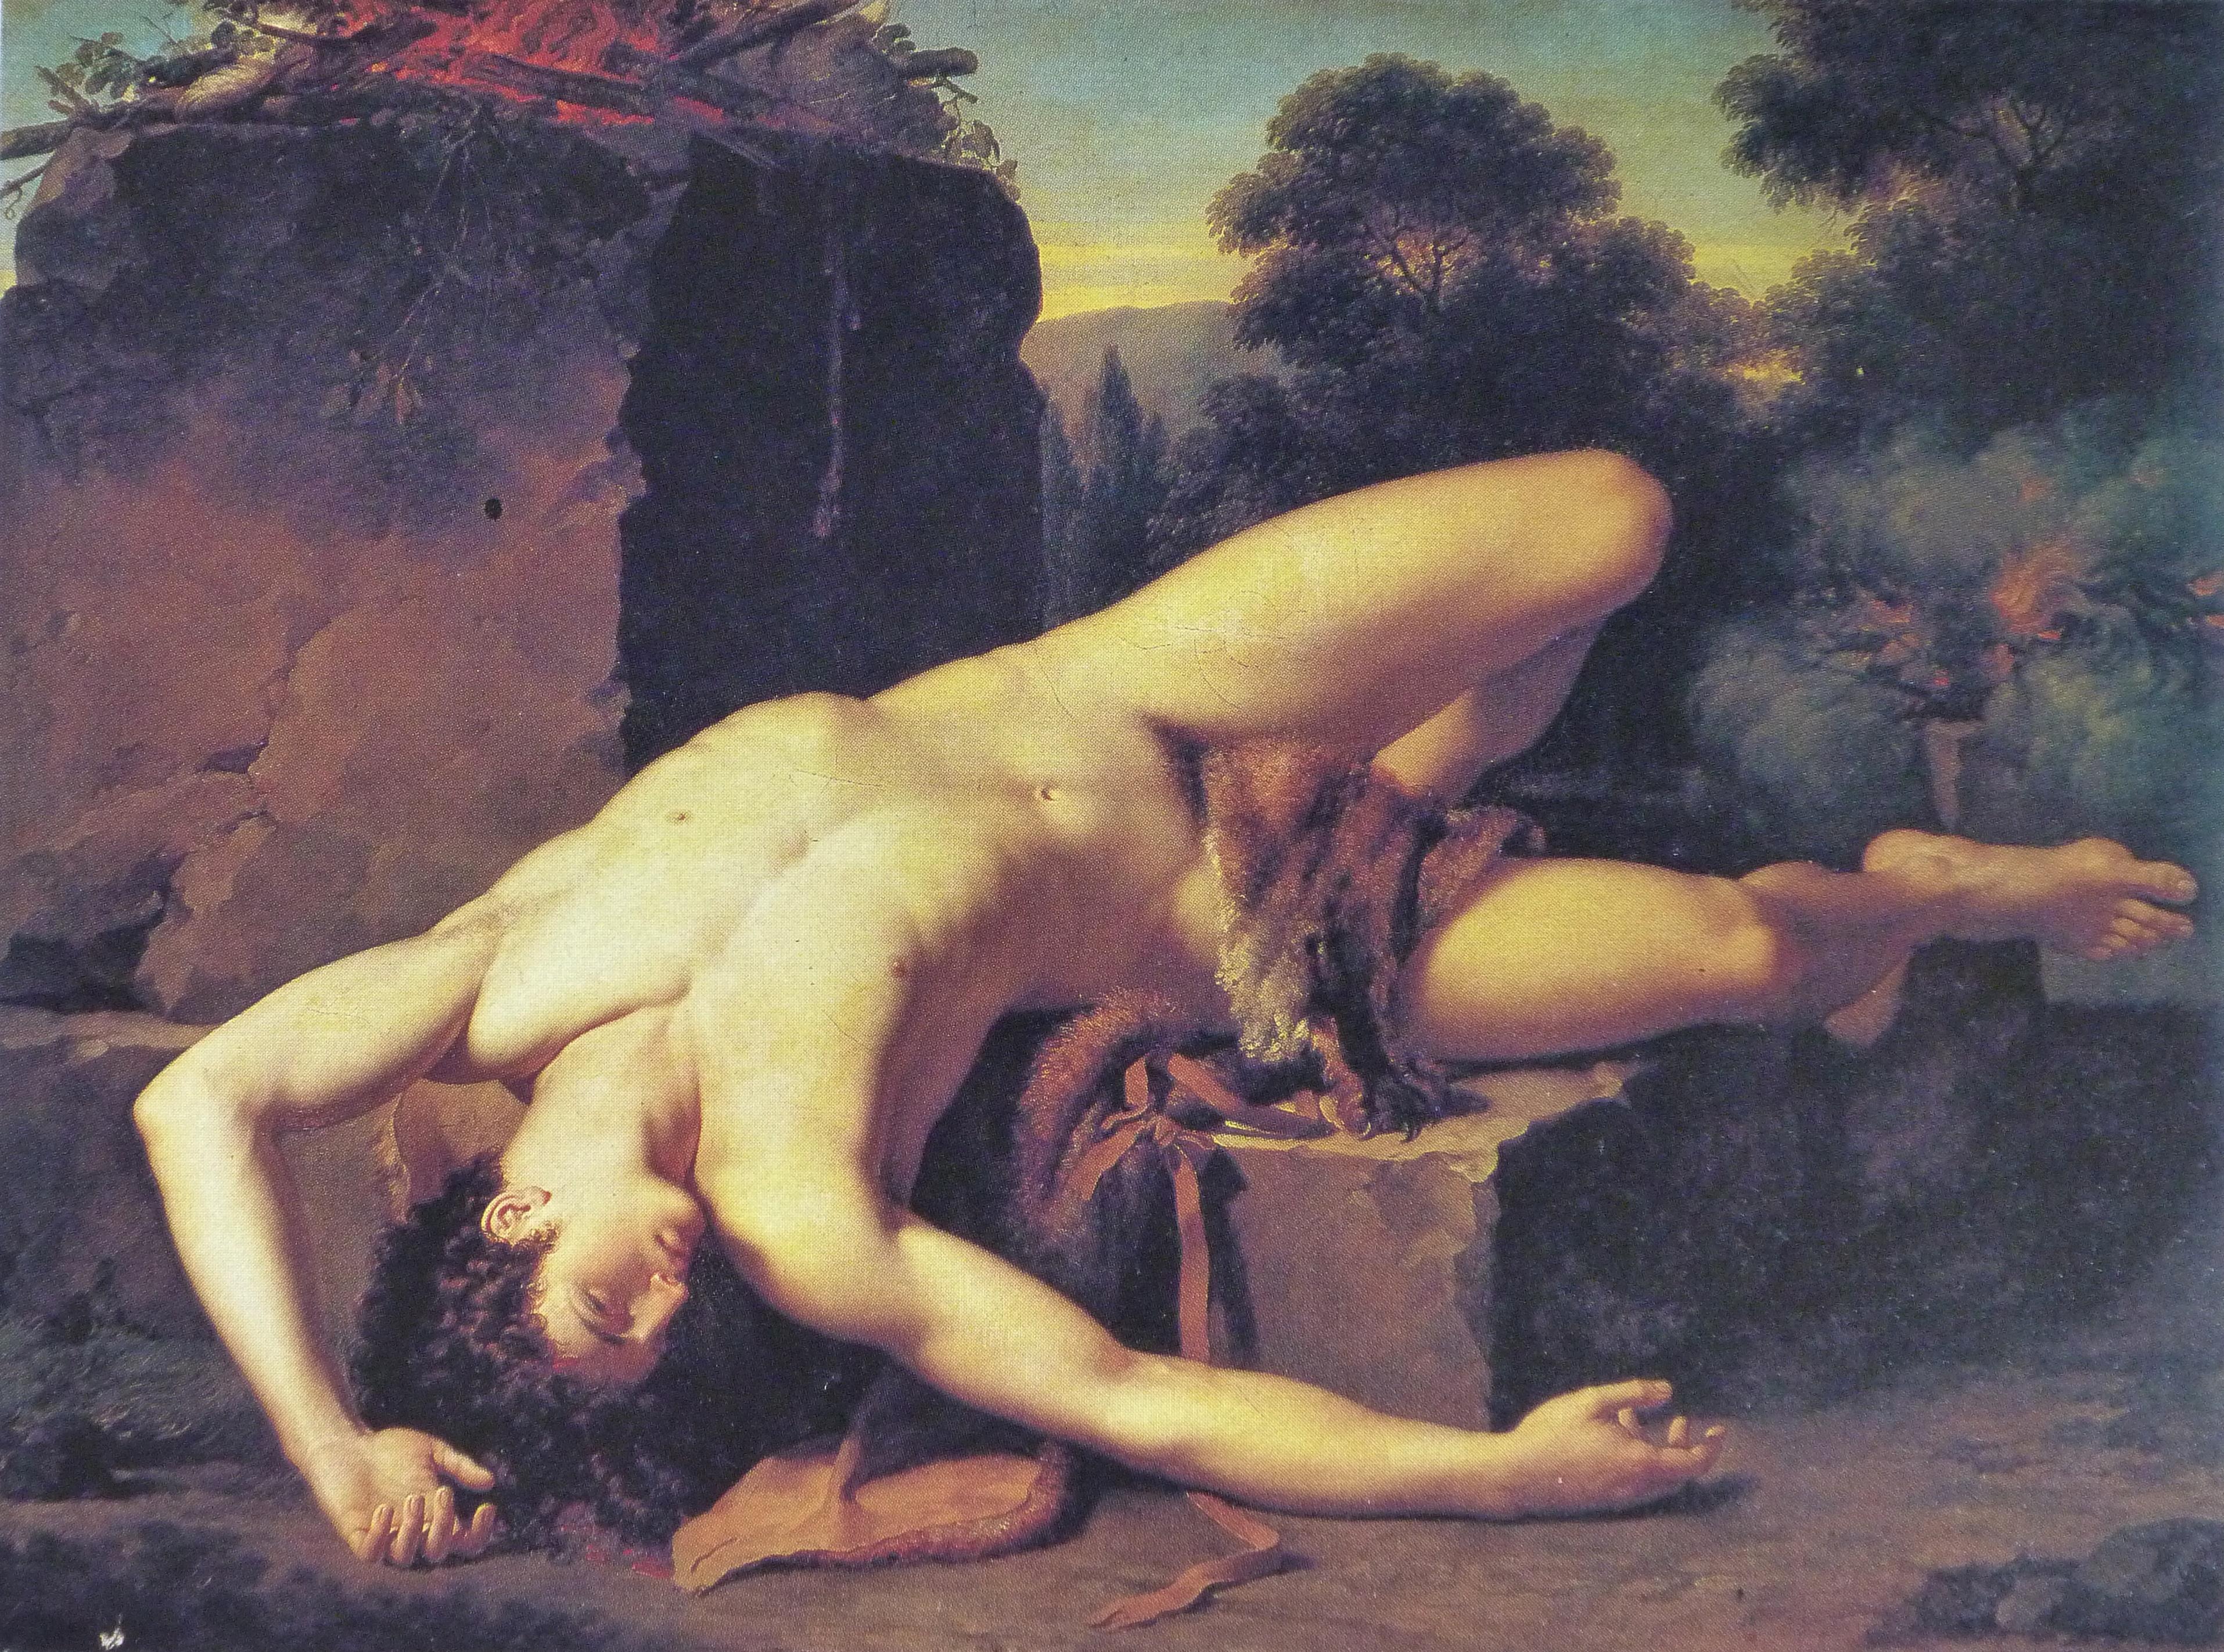 Figura 9 - François-Xavier Fabre, Morte de Abel